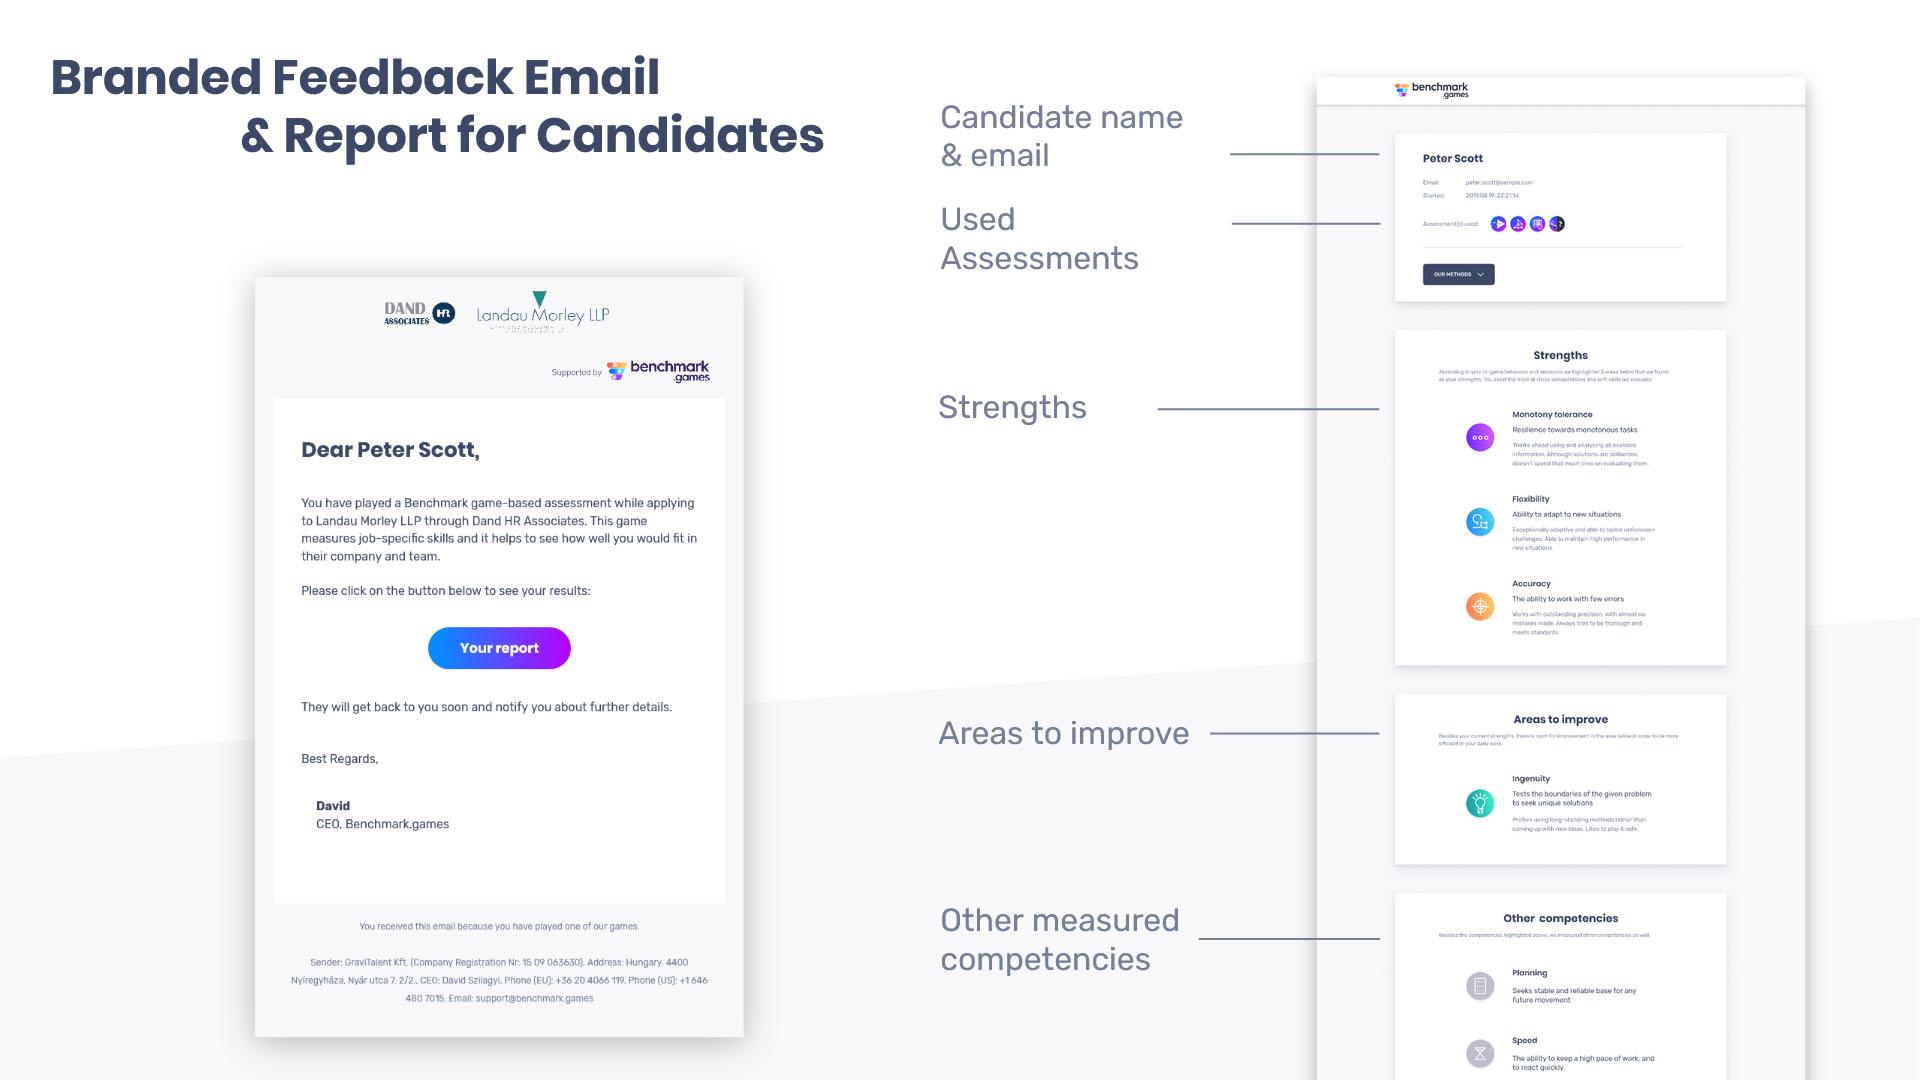 Candidate report & feedback